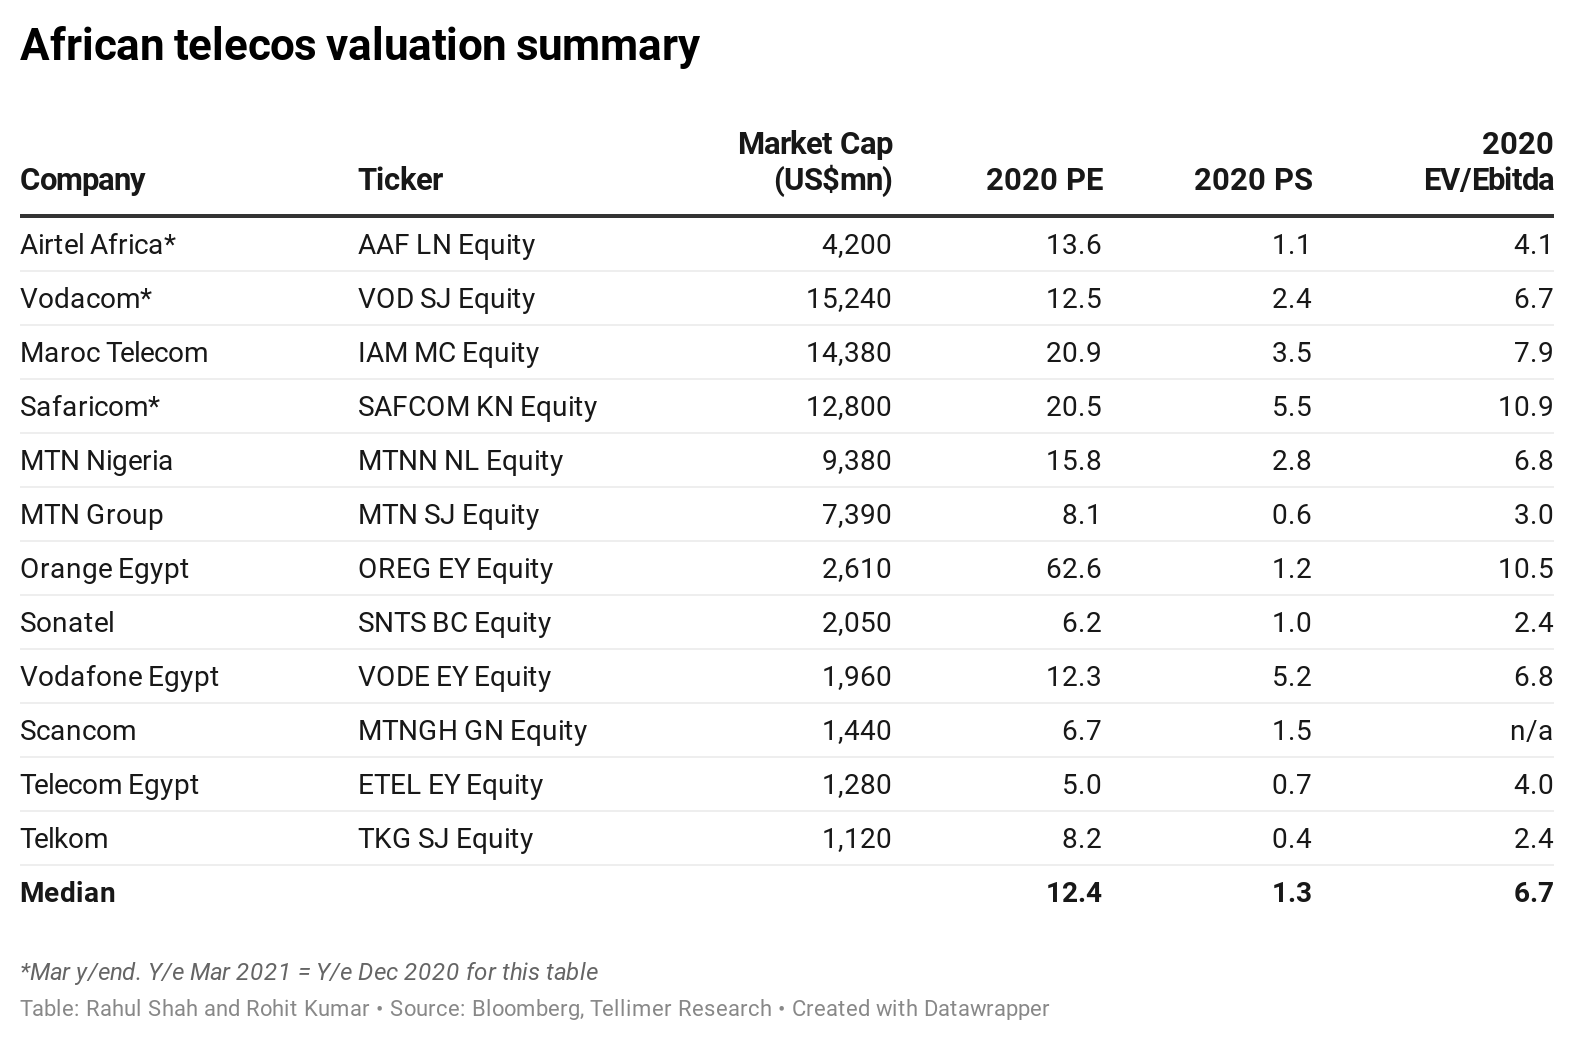 African telecos valuation summary